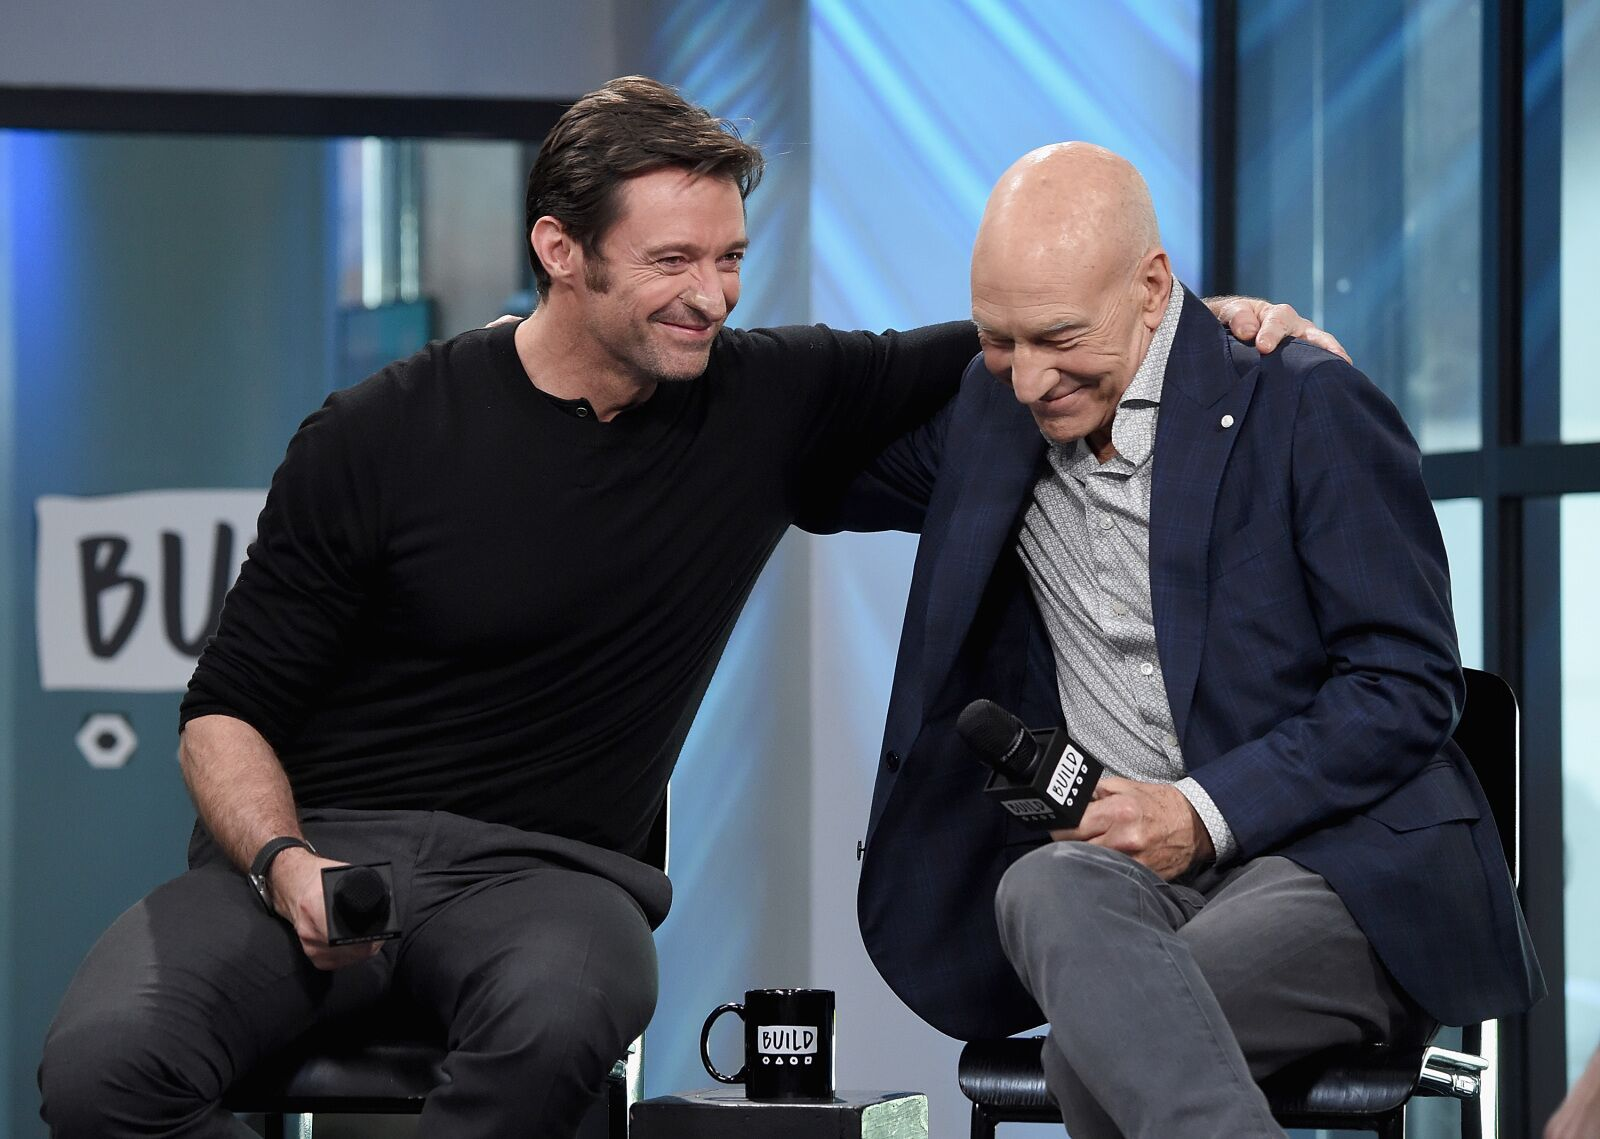 Hugh Jackman and Patrick Stewart set world record for Marvel roles